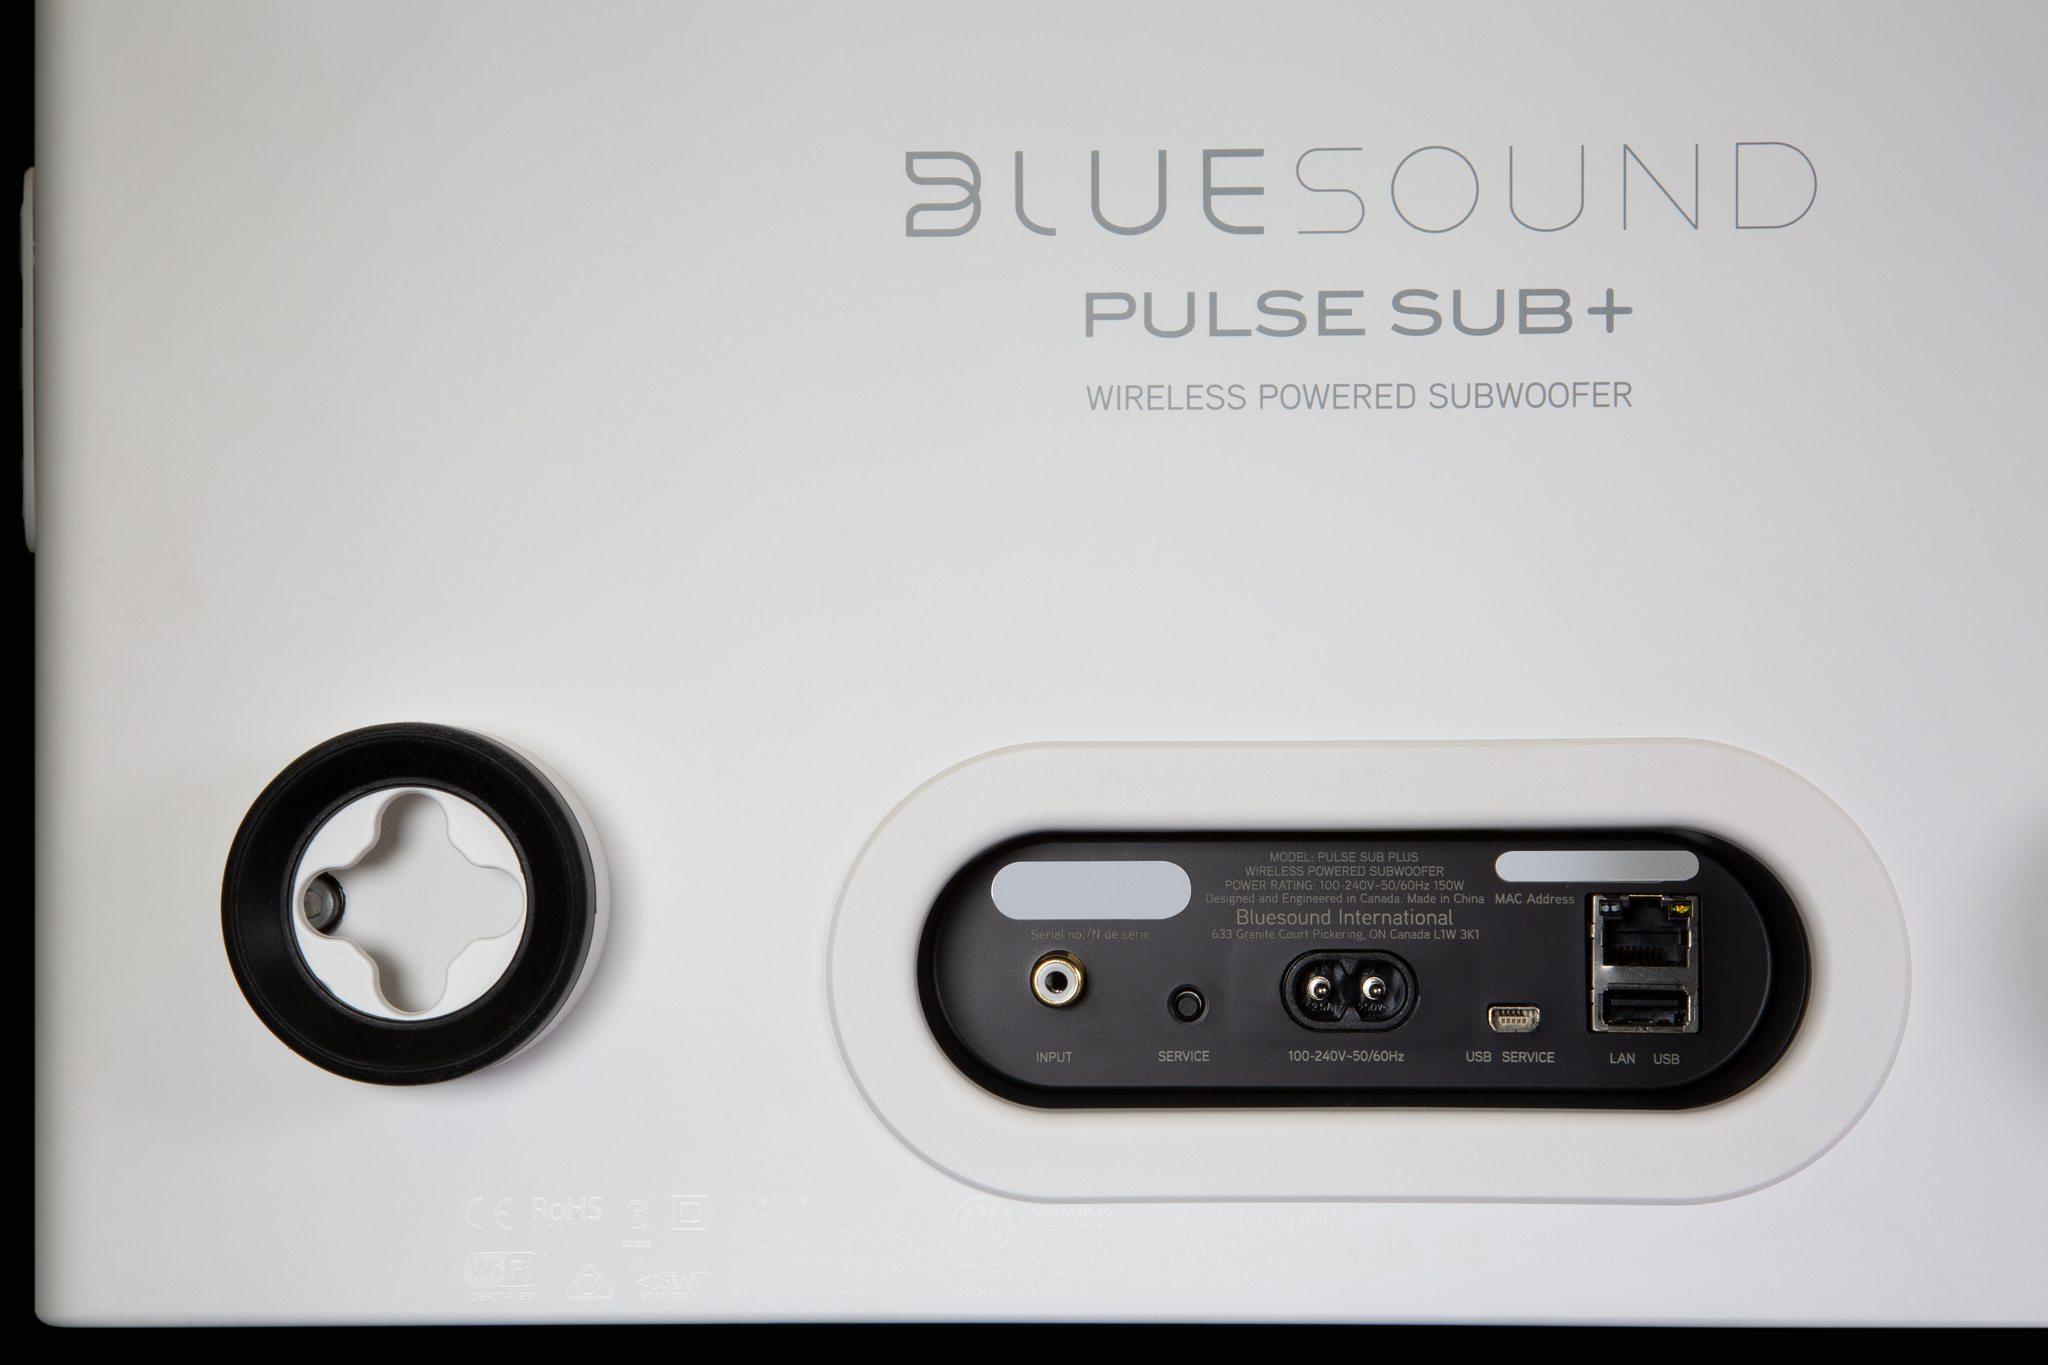 bluesound PULSE SUB